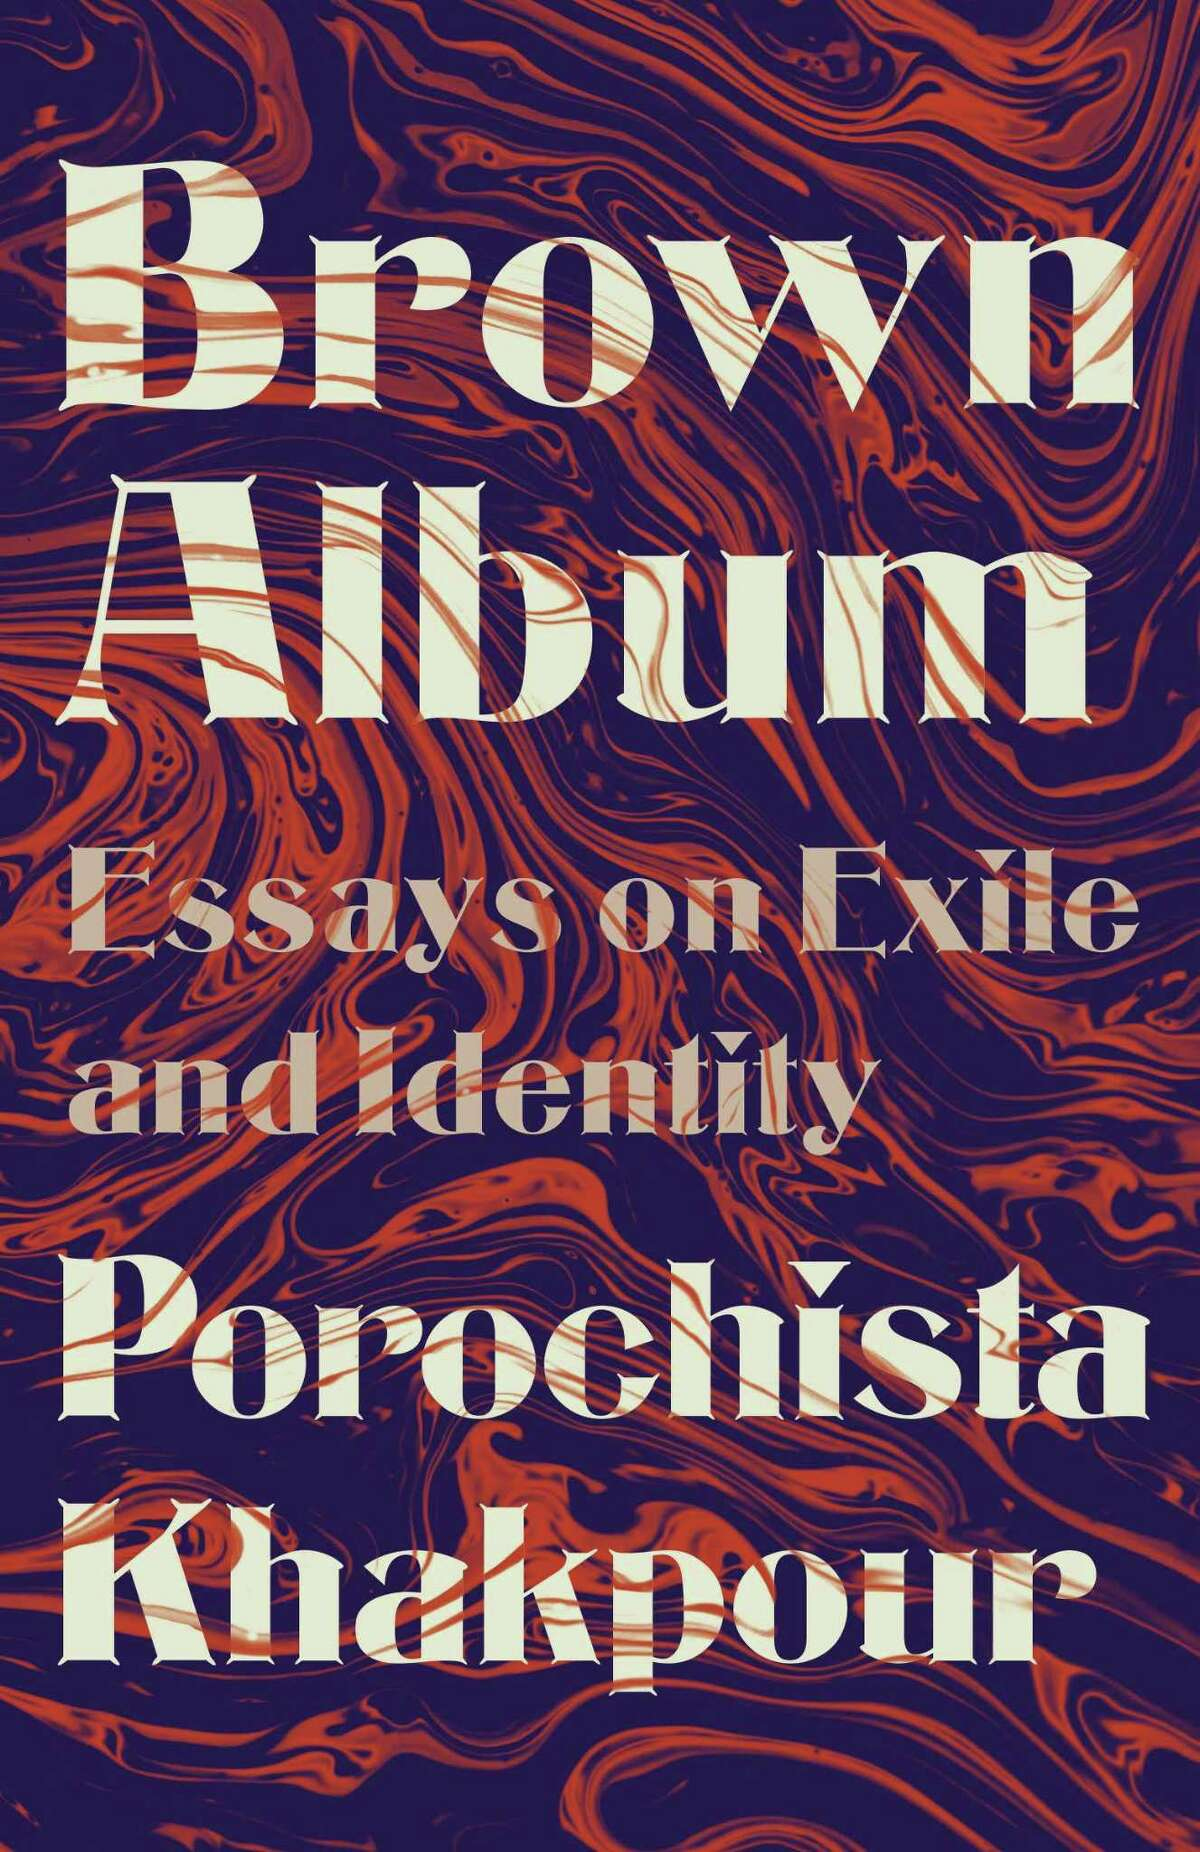 """Brown Album: Essays on Exile and Identity,"" Porochista Khakpour (Vintage, 2020)"